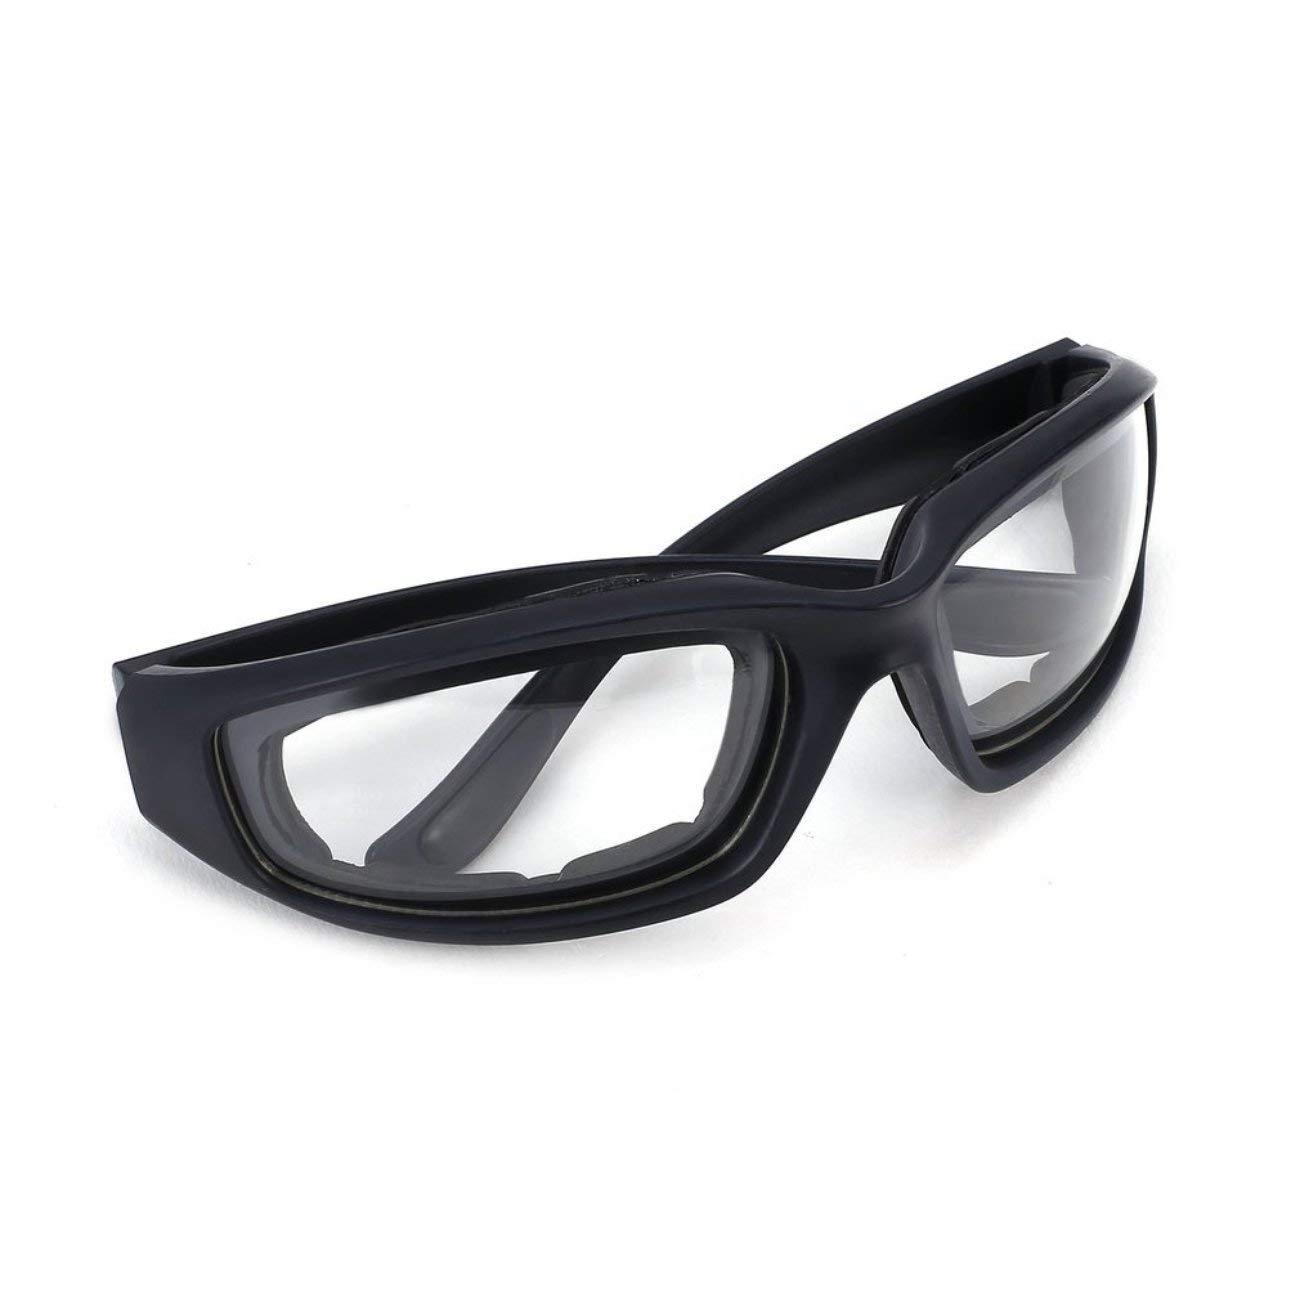 Fannty Gafas para Motocicleta Gafas a Prueba de Viento a Prueba de Polvo Gafas para Exteriores Gafas para Exteriores